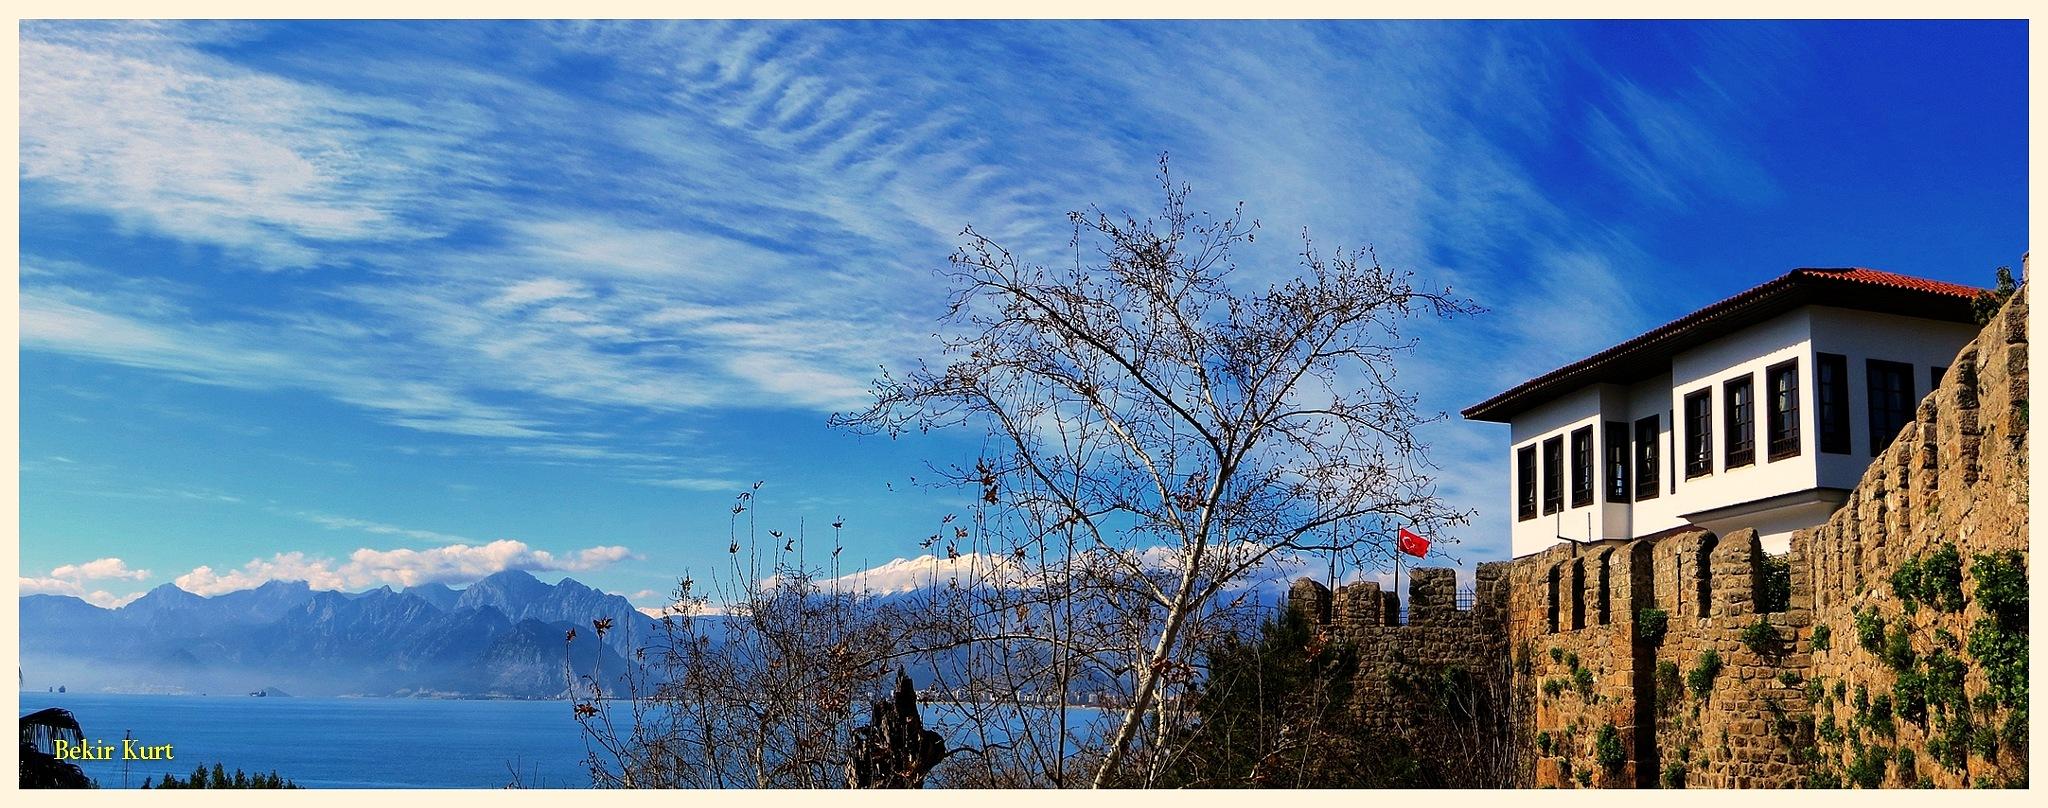 Looking At The Bey Mountains, Antalya / Turkey by Bekir Kurt